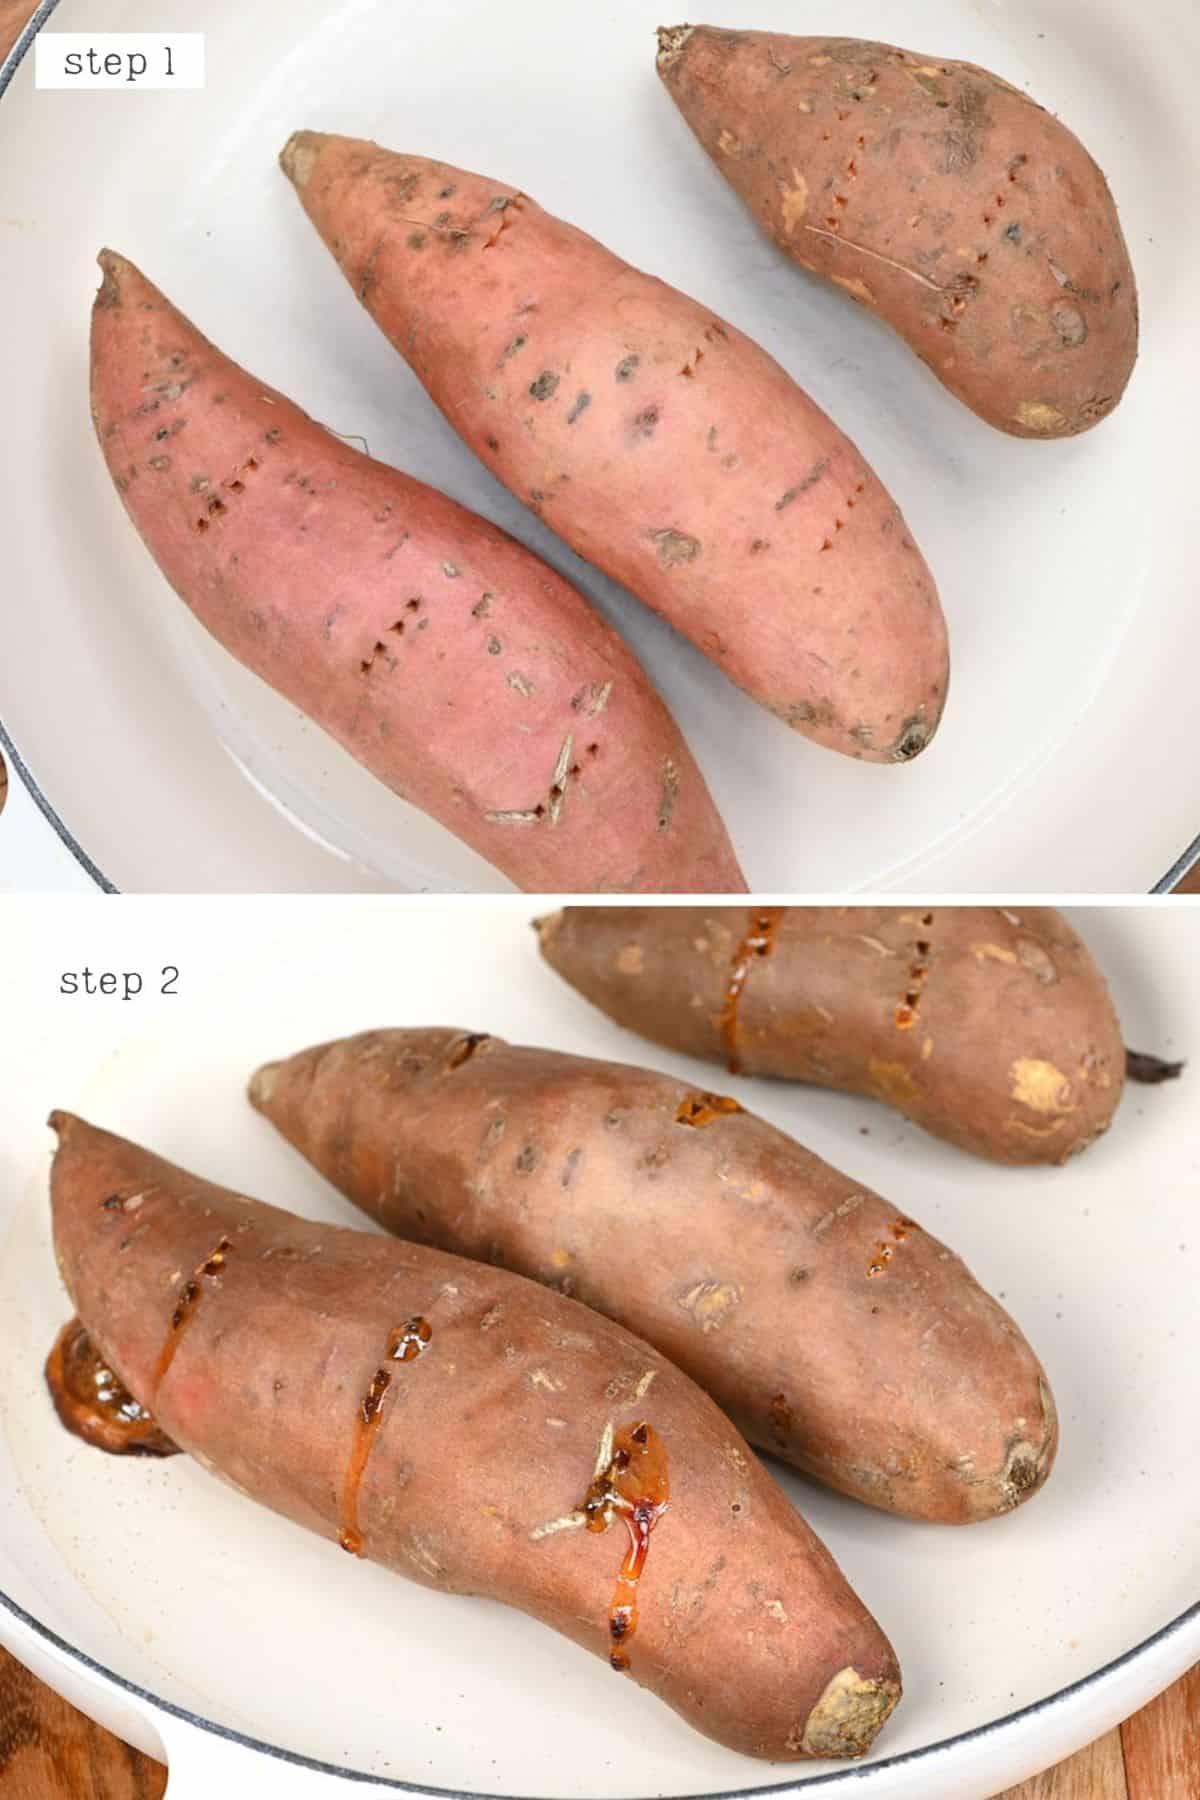 Steps for baking sweet potatoes